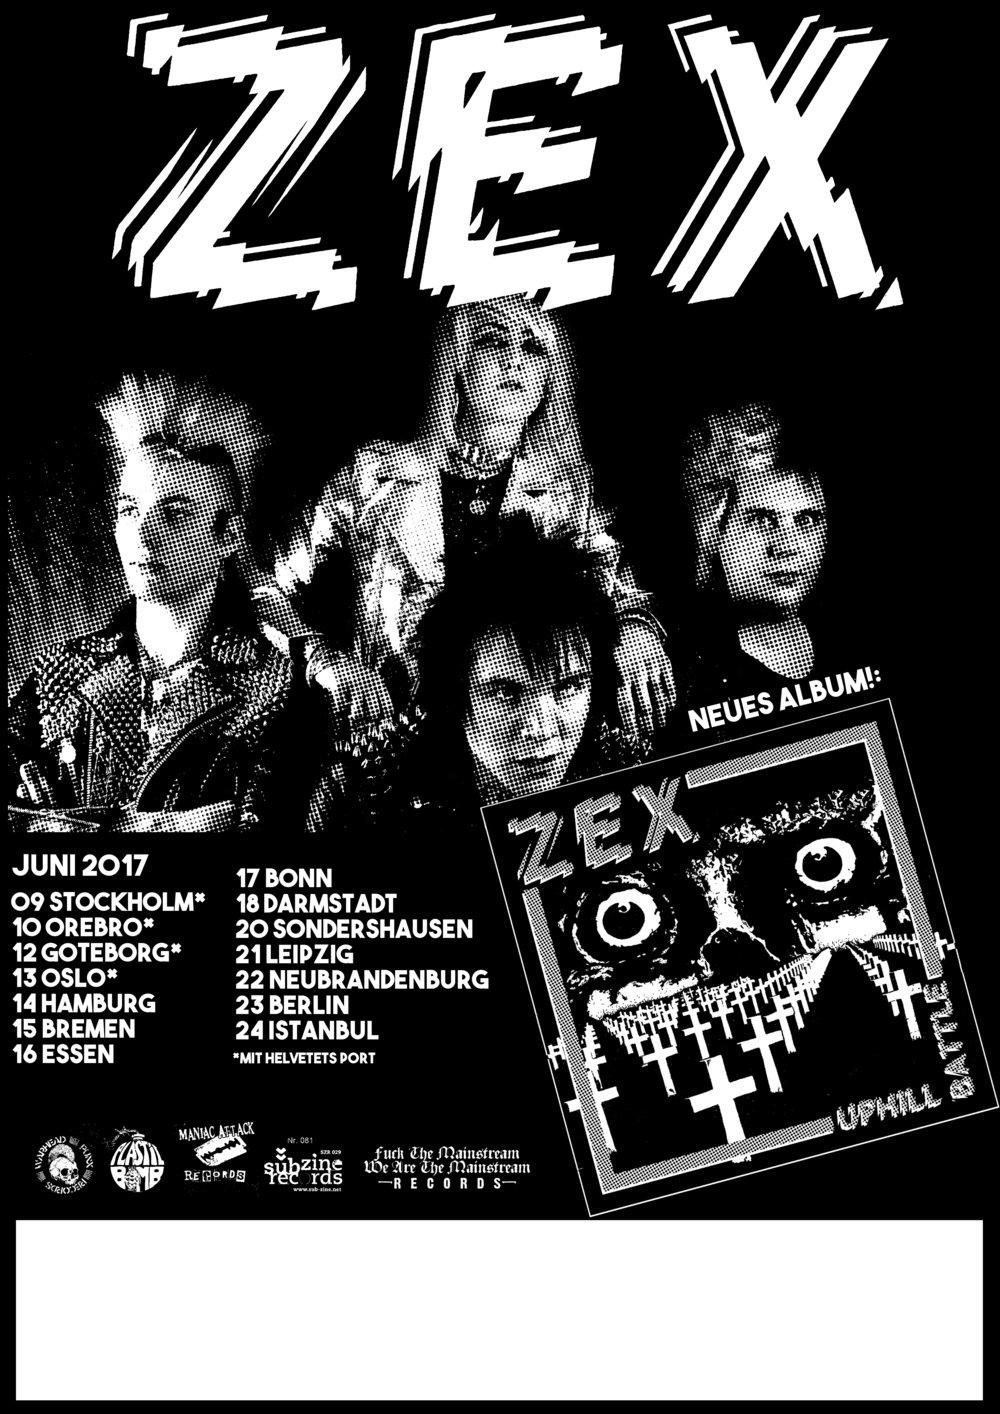 flyer-17.06.08-eurotour.jpg